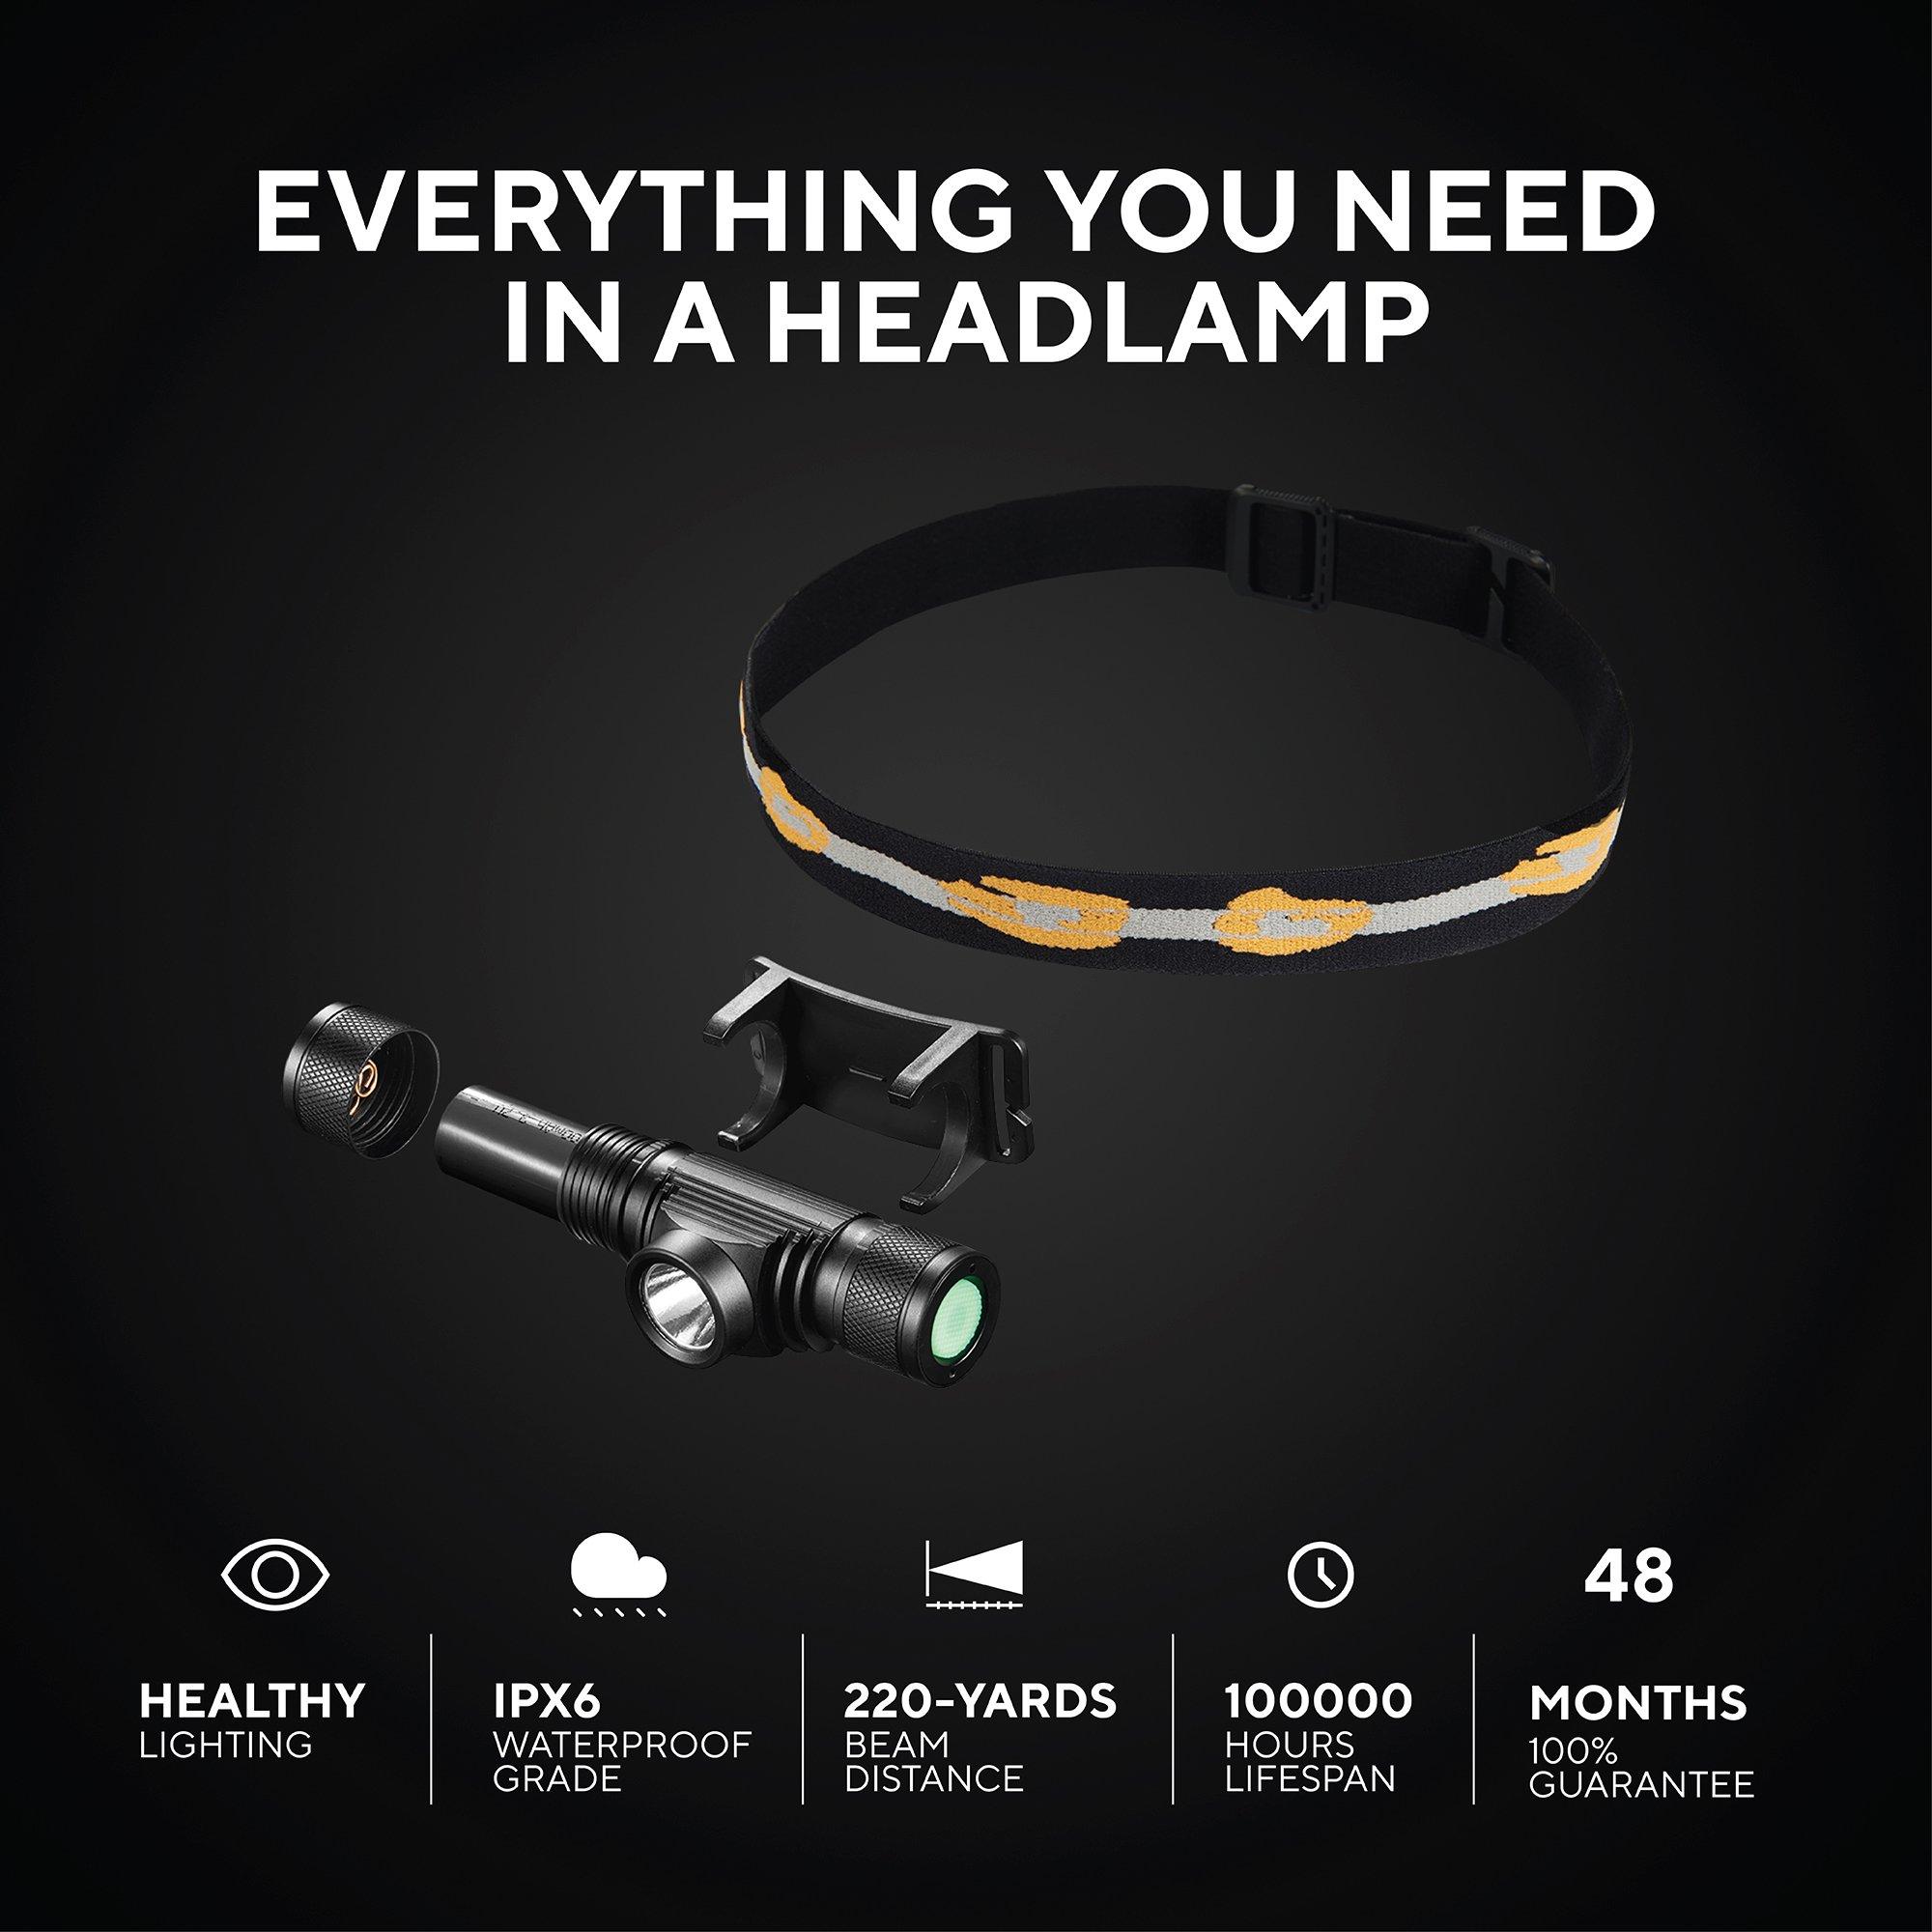 SLONIK - Adjustable beam - 500 Lumen Rechargeable LED Headlamp 2200 mAh Battery - Lightweight, Durable, Waterproof and Dustproof Headlight - Amazing 220-yards Beam - Great as Camping and Hiking Gear by SLONIK (Image #6)